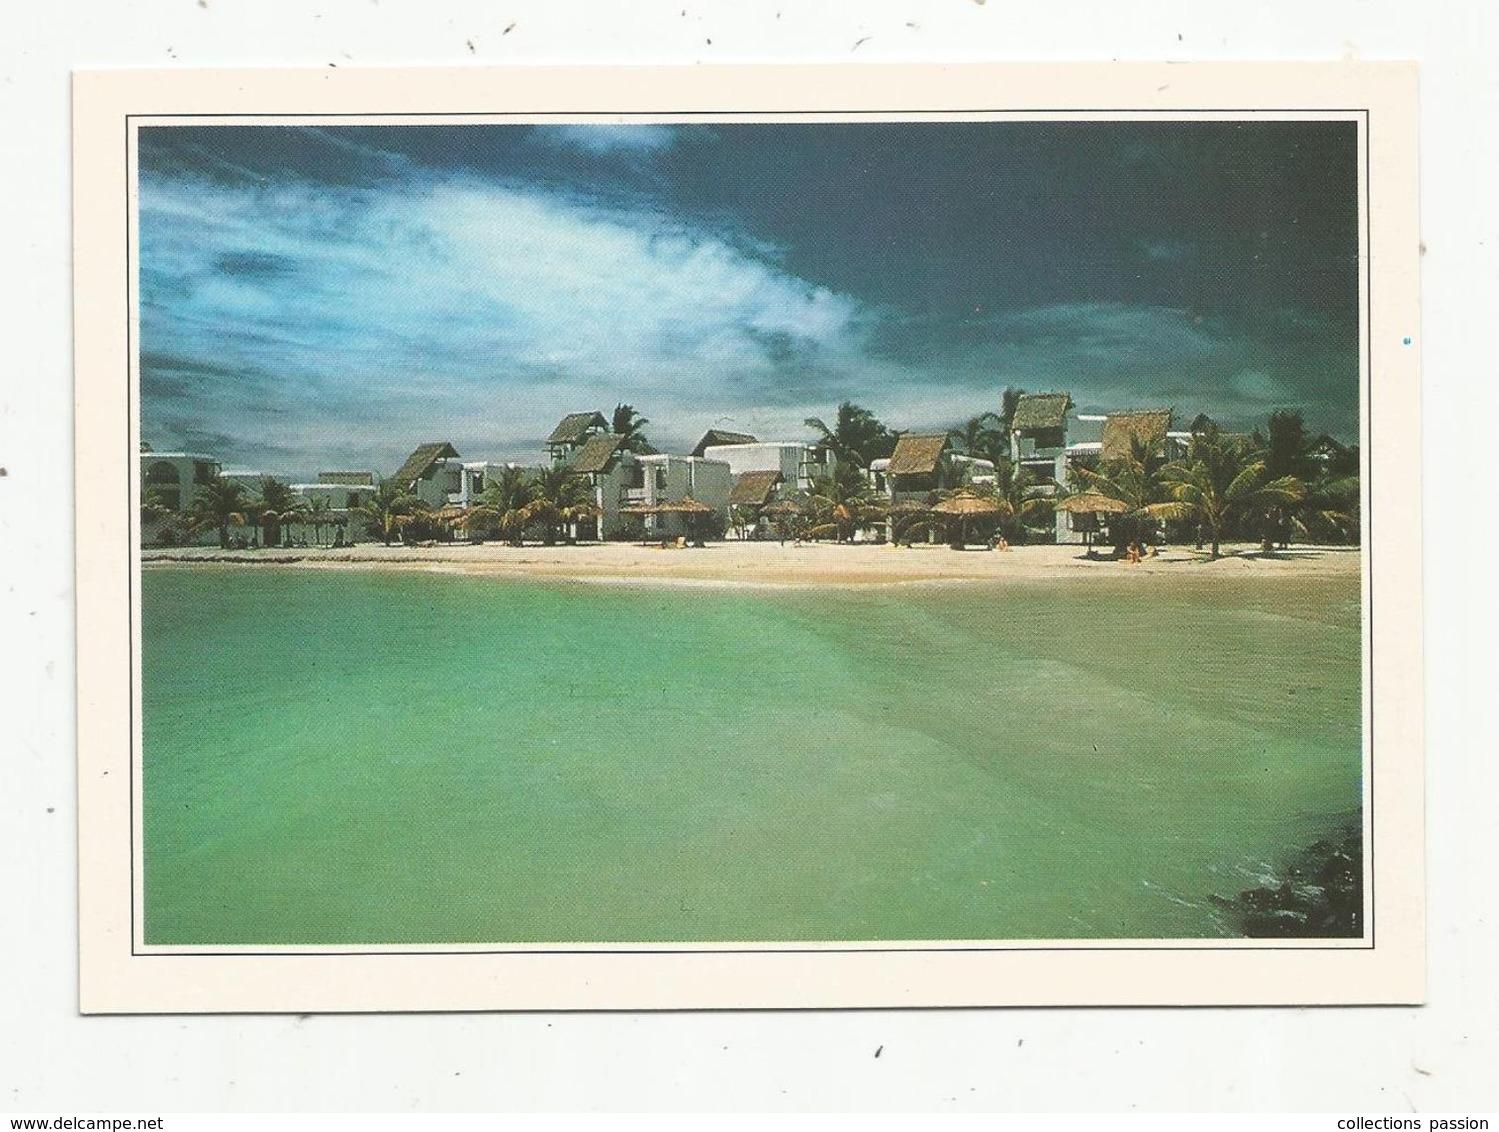 Cp , Ile MAURICE , MAURITIUS , Village De Vacance à Touessrok , Holiday Resort At Touessrok, Photo Renaudeau/Hoa-Qui - Maurice